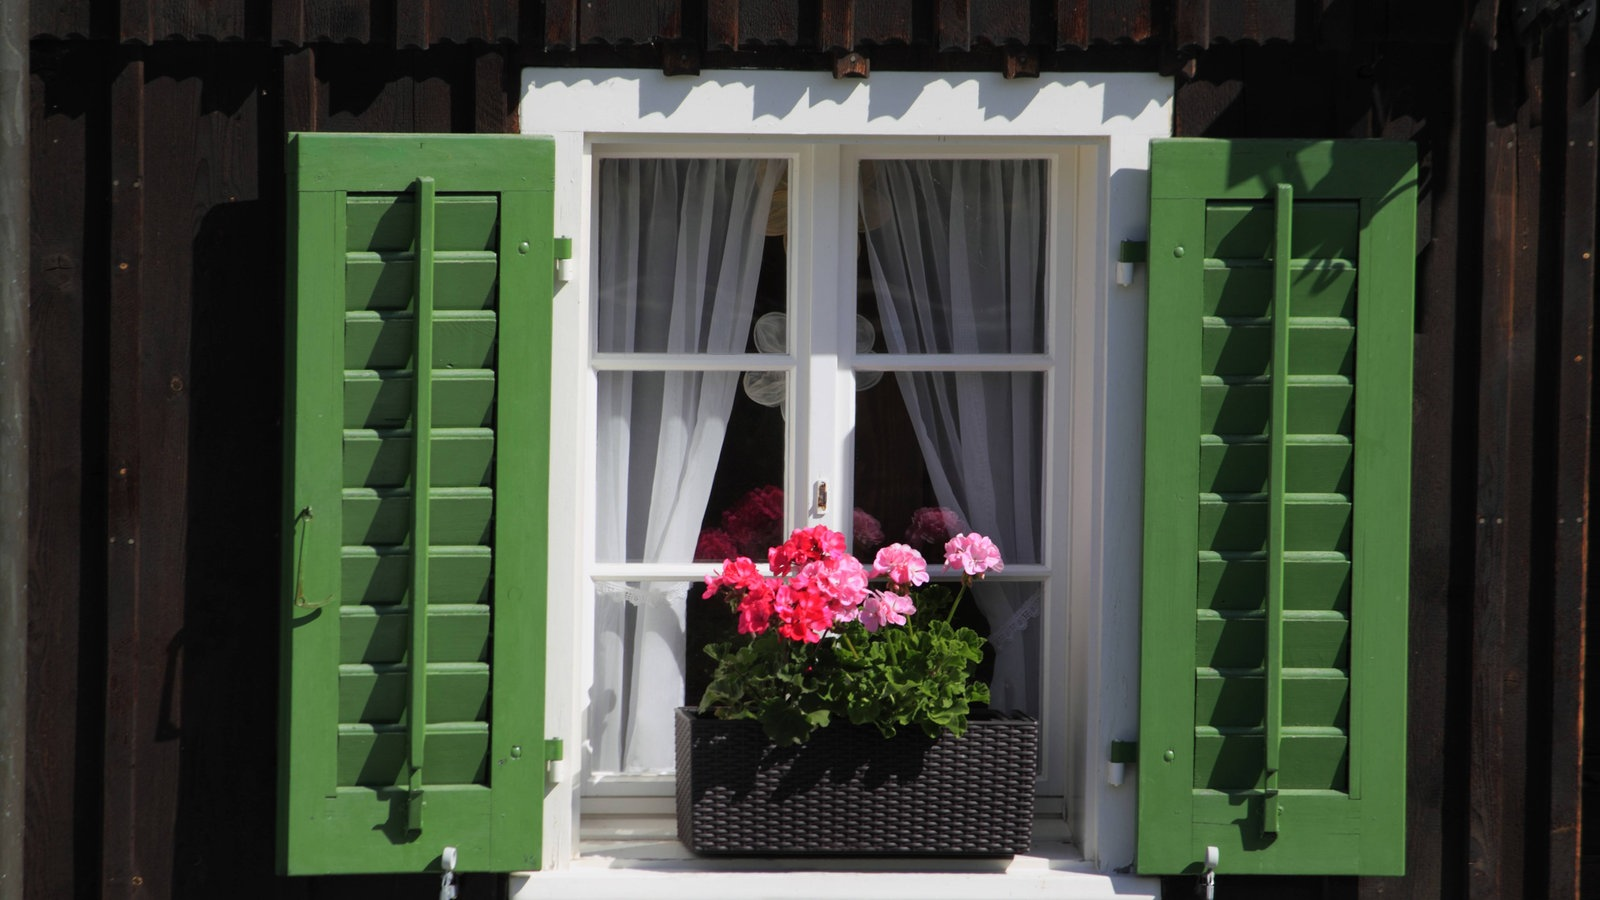 sendung swr mythos heimat sendungen. Black Bedroom Furniture Sets. Home Design Ideas